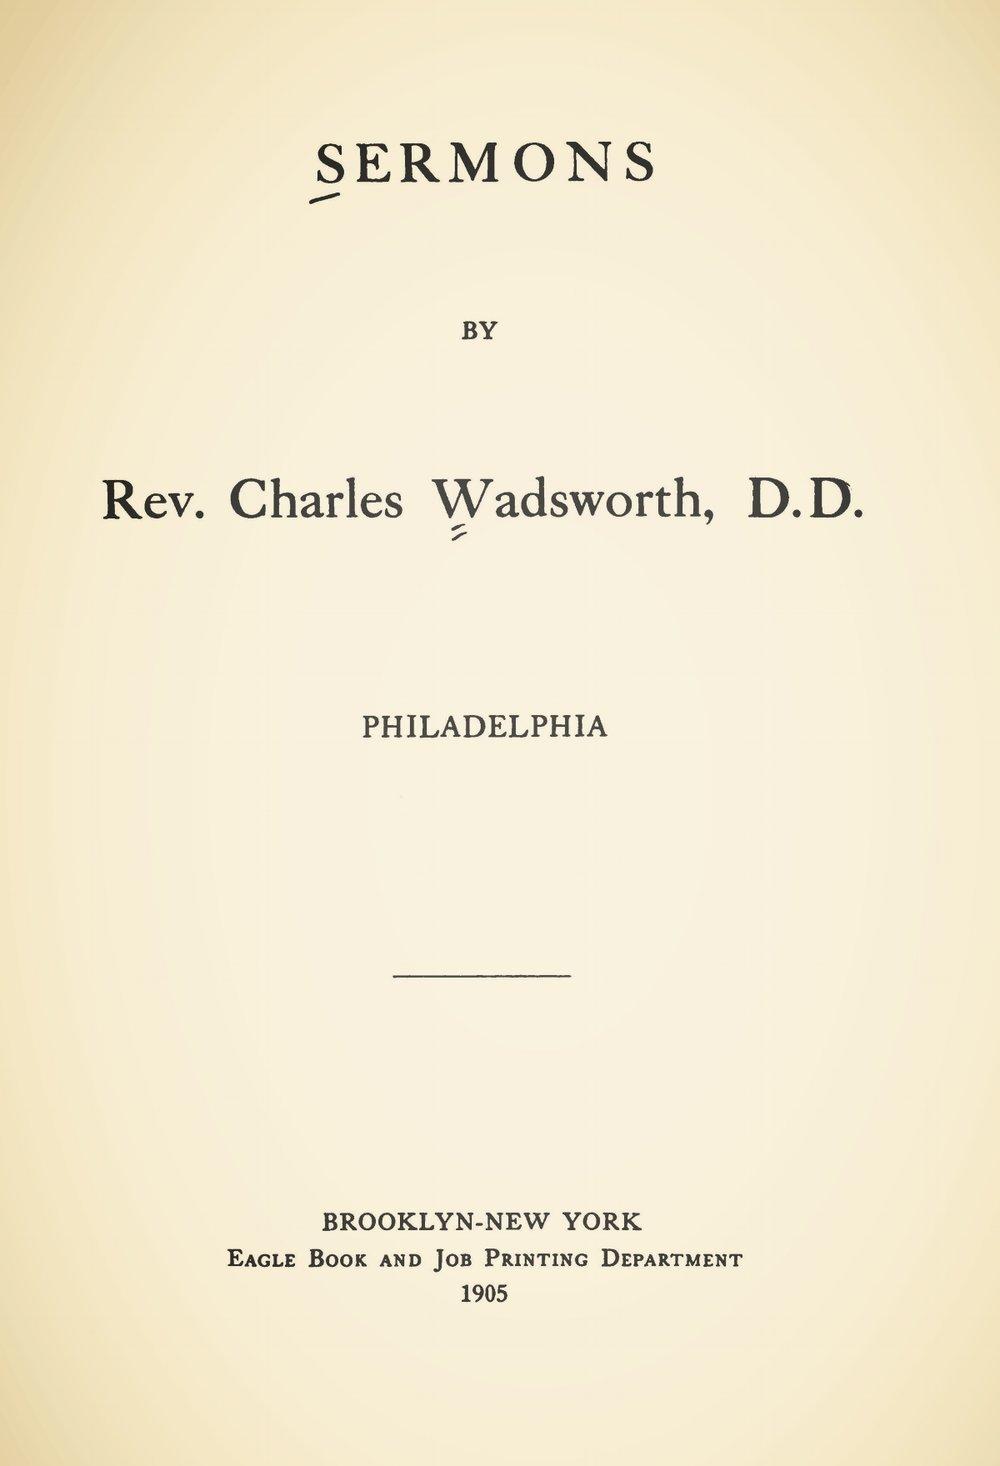 Wadsworth, Charles, Sermons 1905 Title Page.jpg